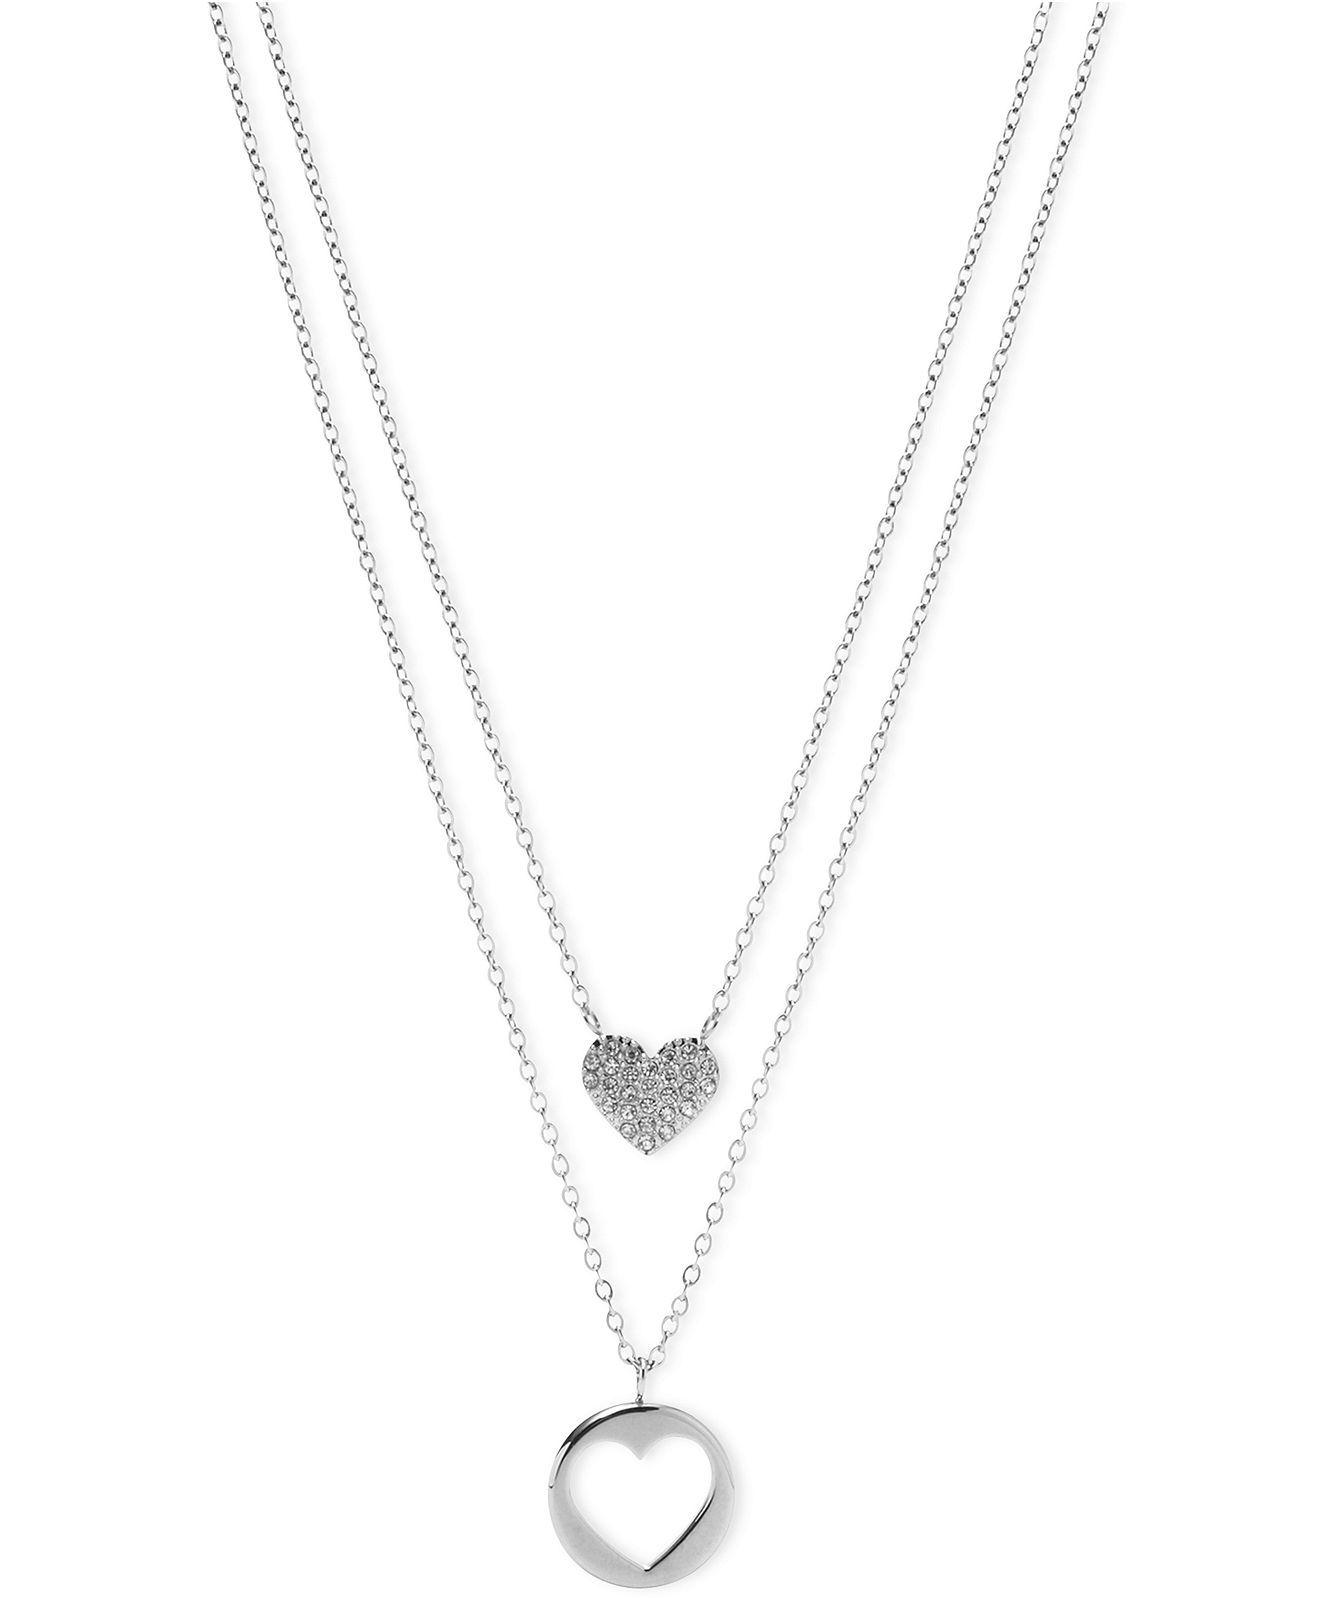 Fossil necklace silver tone heart pendant double chain necklace fossil necklace silver tone heart pendant double chain necklace mozeypictures Gallery